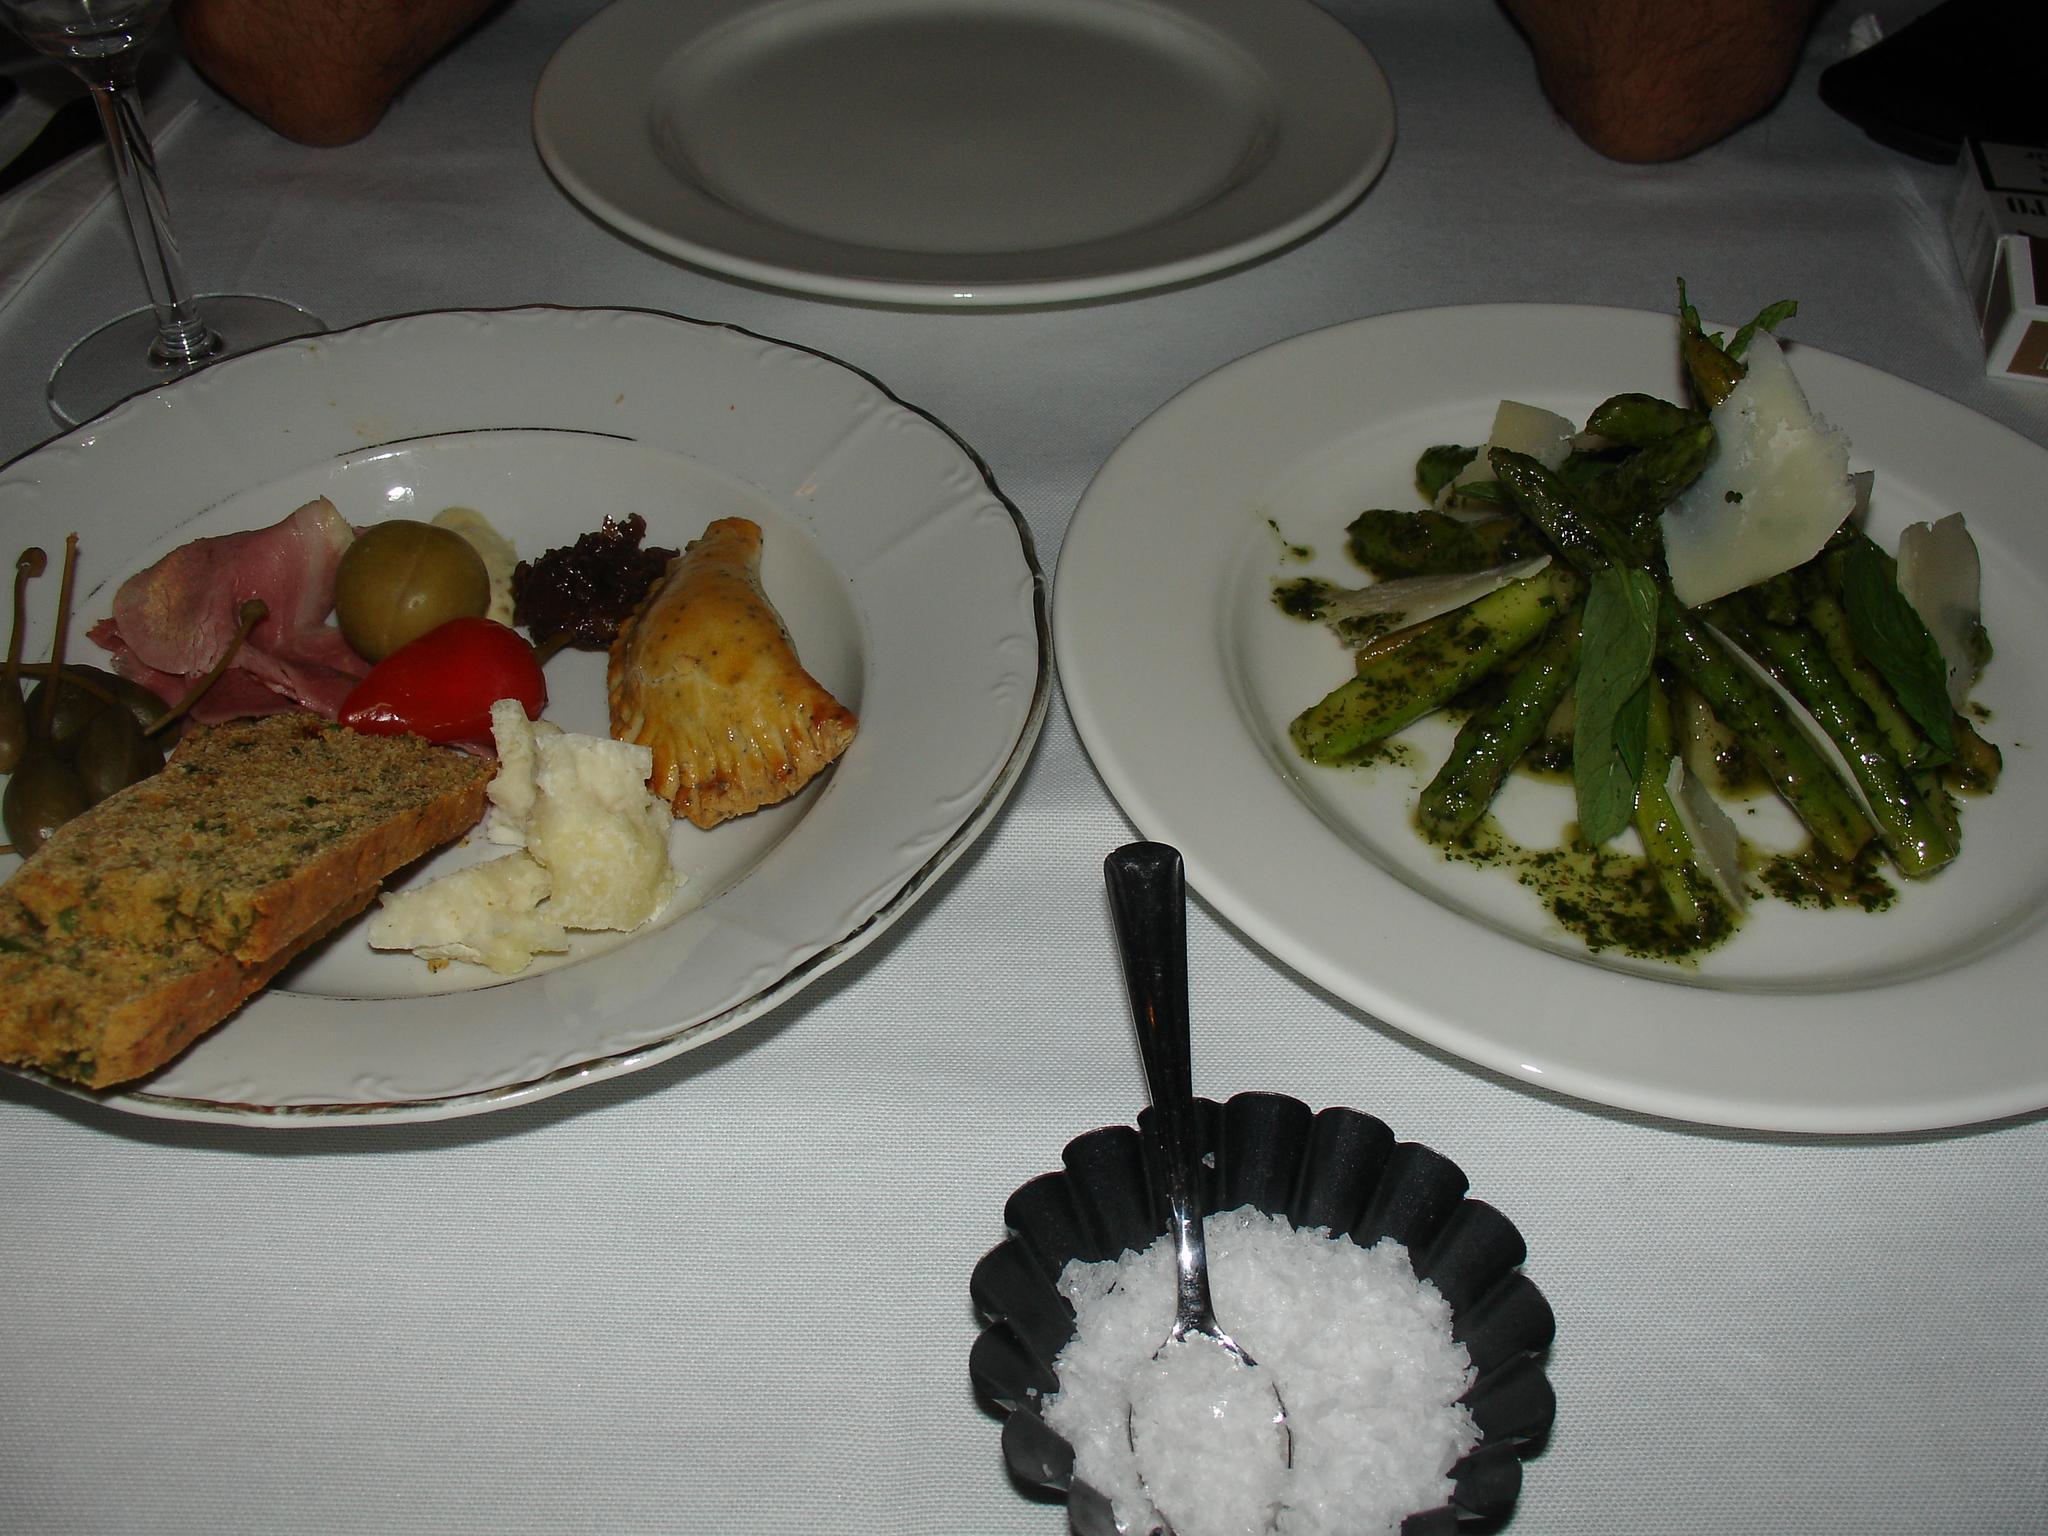 kopyasi-delicatessen-nupera-030109-001.jpg